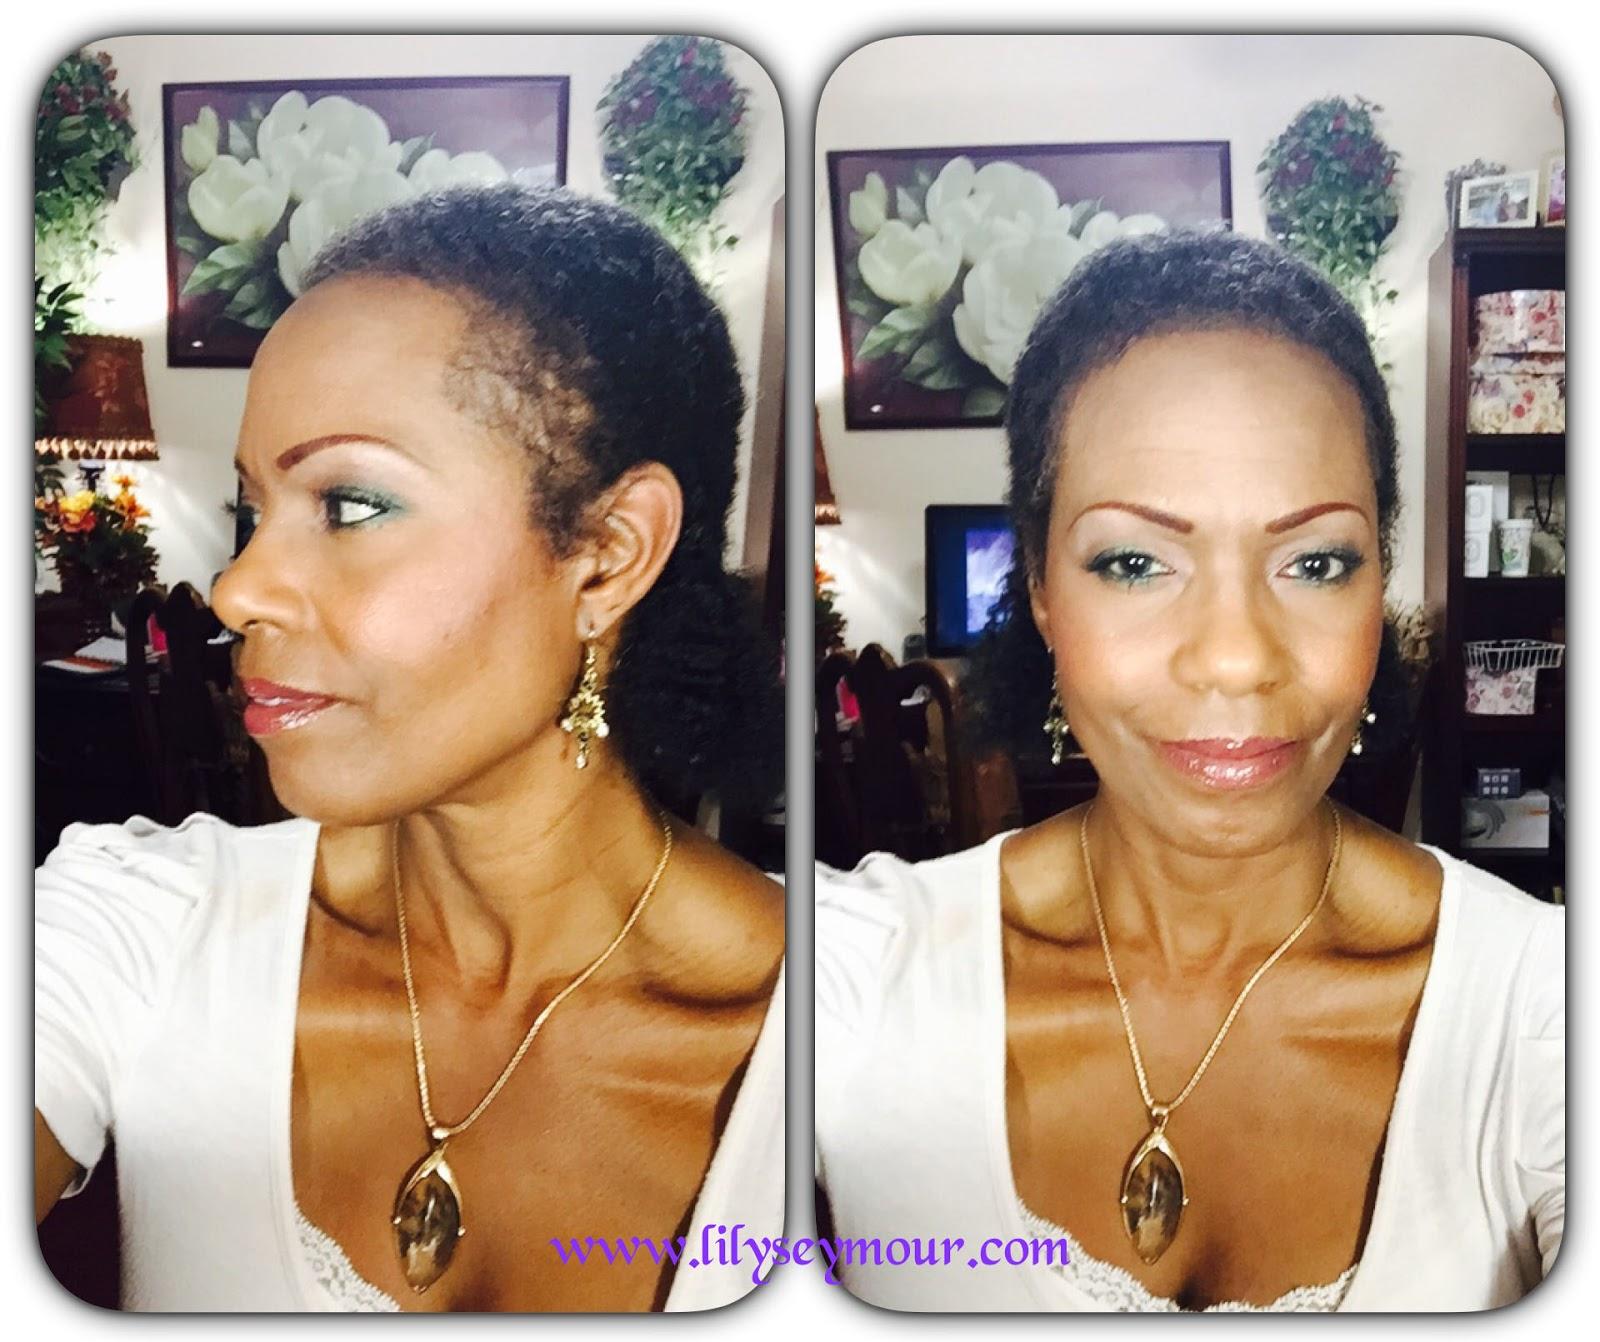 mature | over 50 Beauty Blogger | #womenofcolor #brownskin